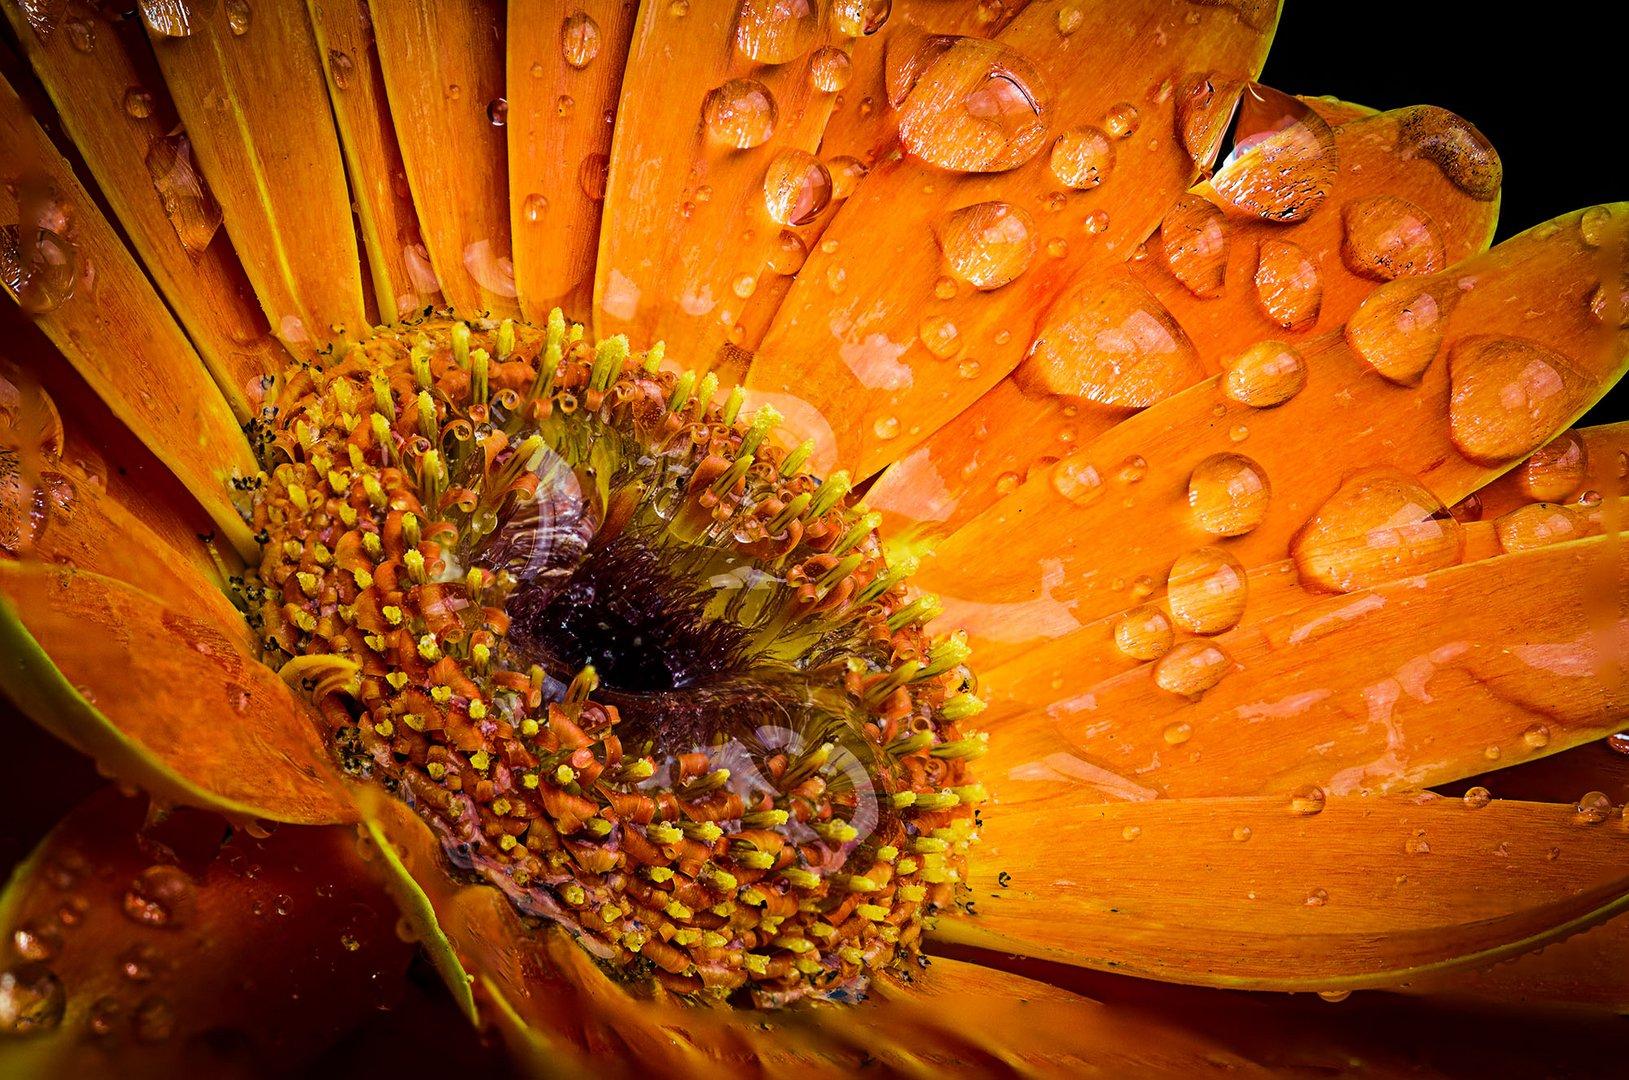 the ultra sharp flower